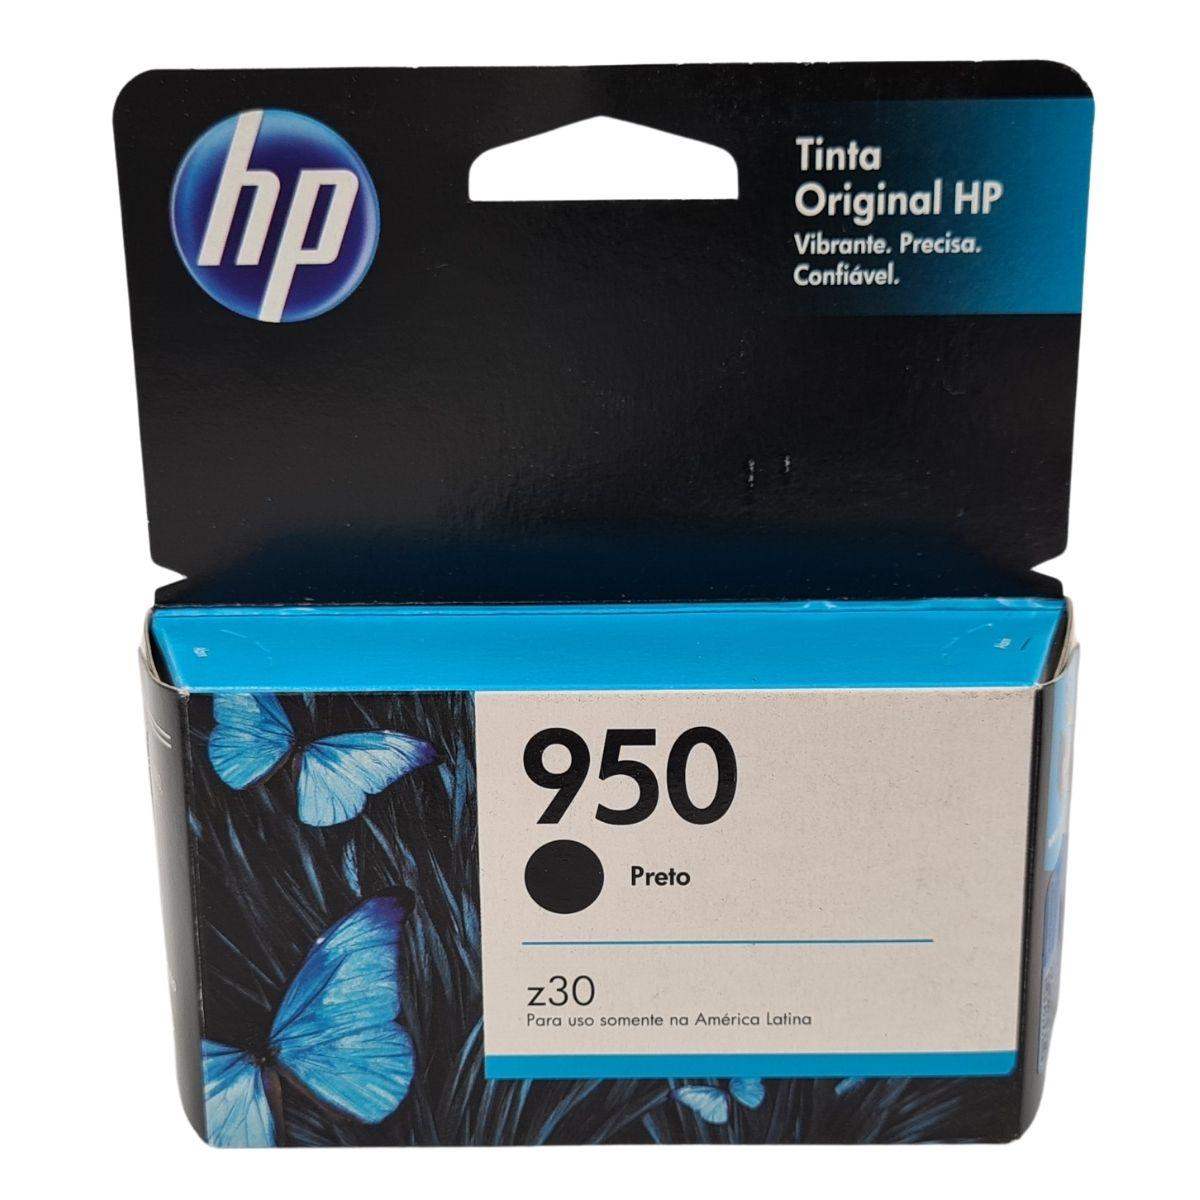 Cartucho HP 950 CN049AL Preto para Pro8100 E Pro8600